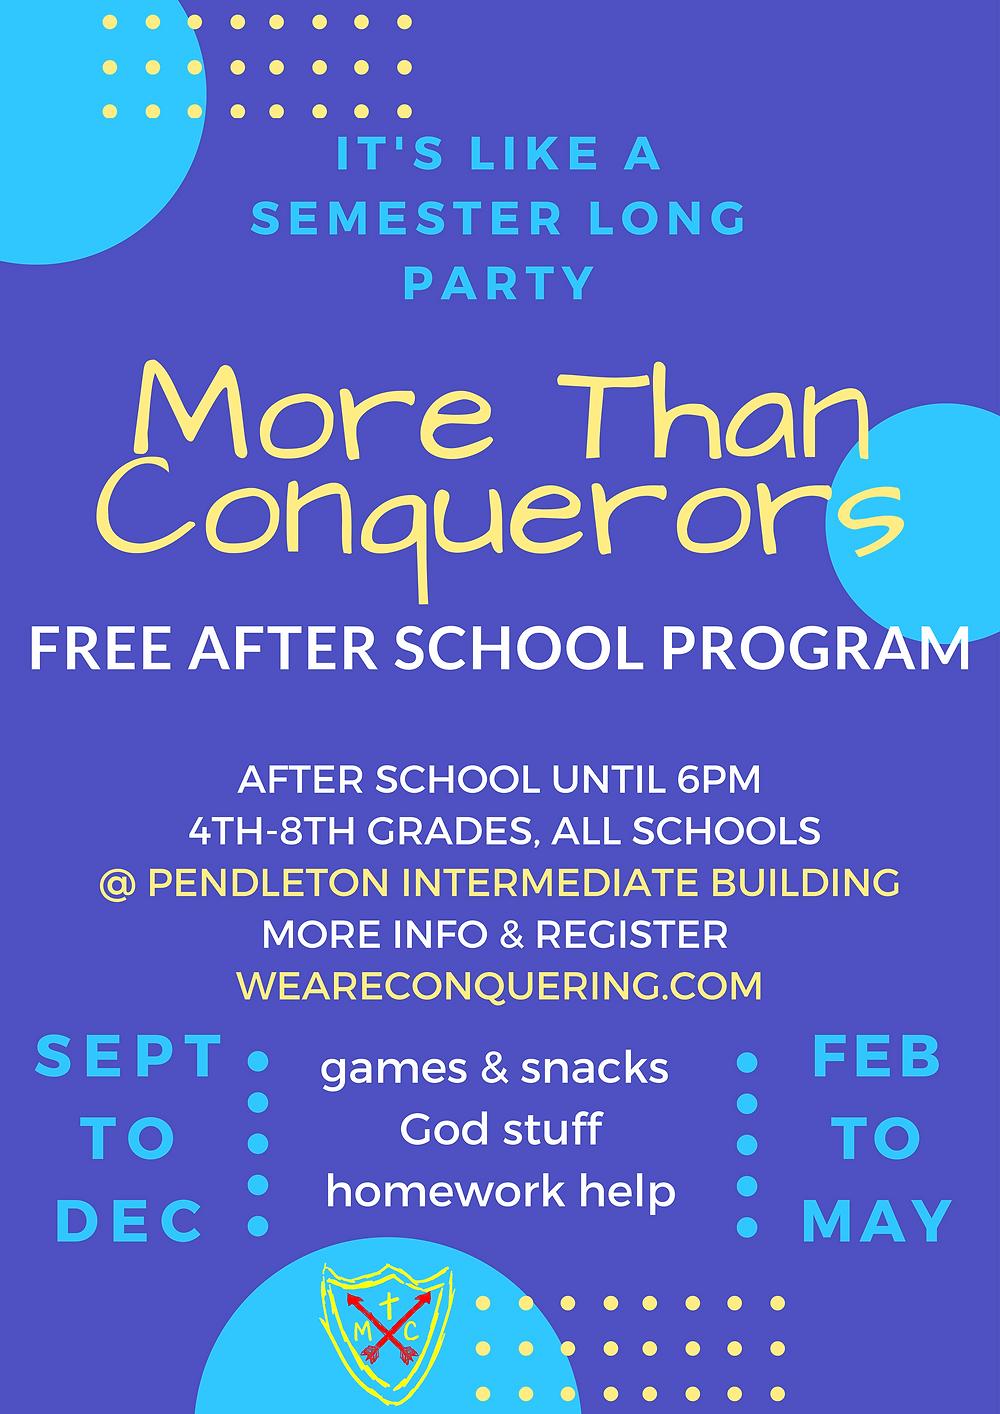 Spring Program runs Feb 26th-May 24th!